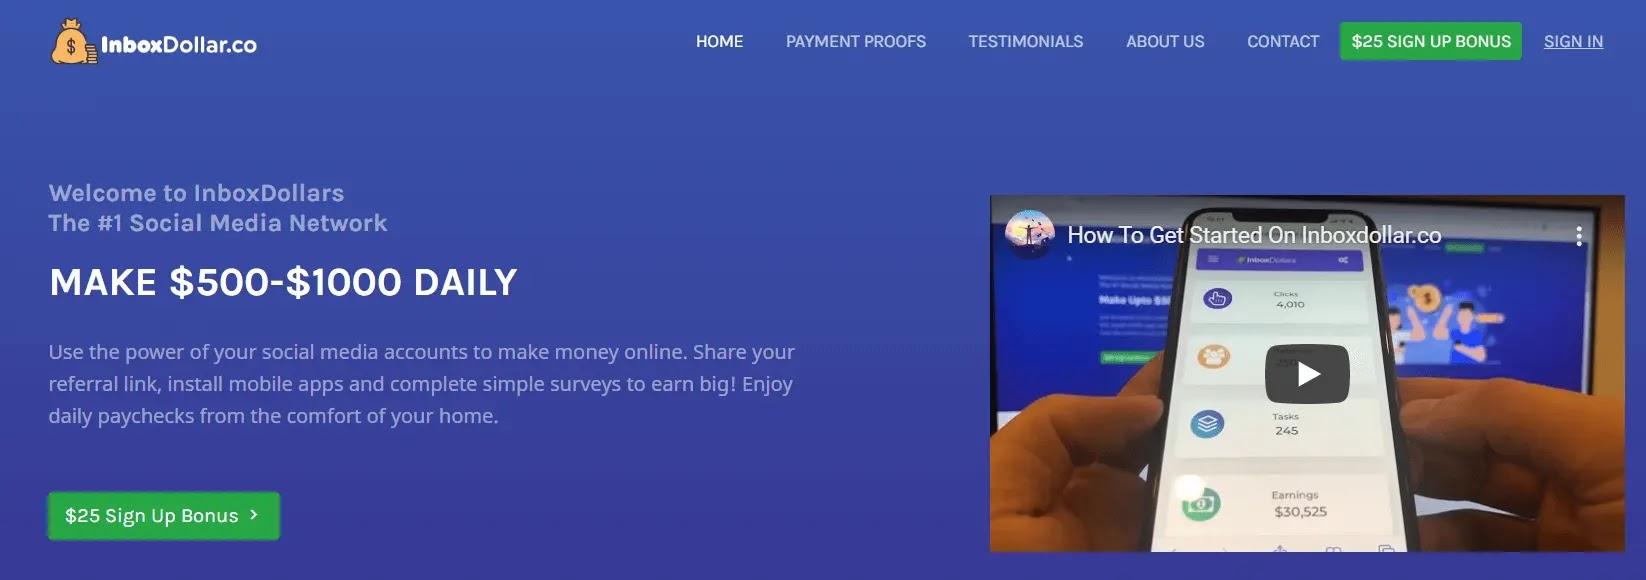 InboxDollar - PTC Sites